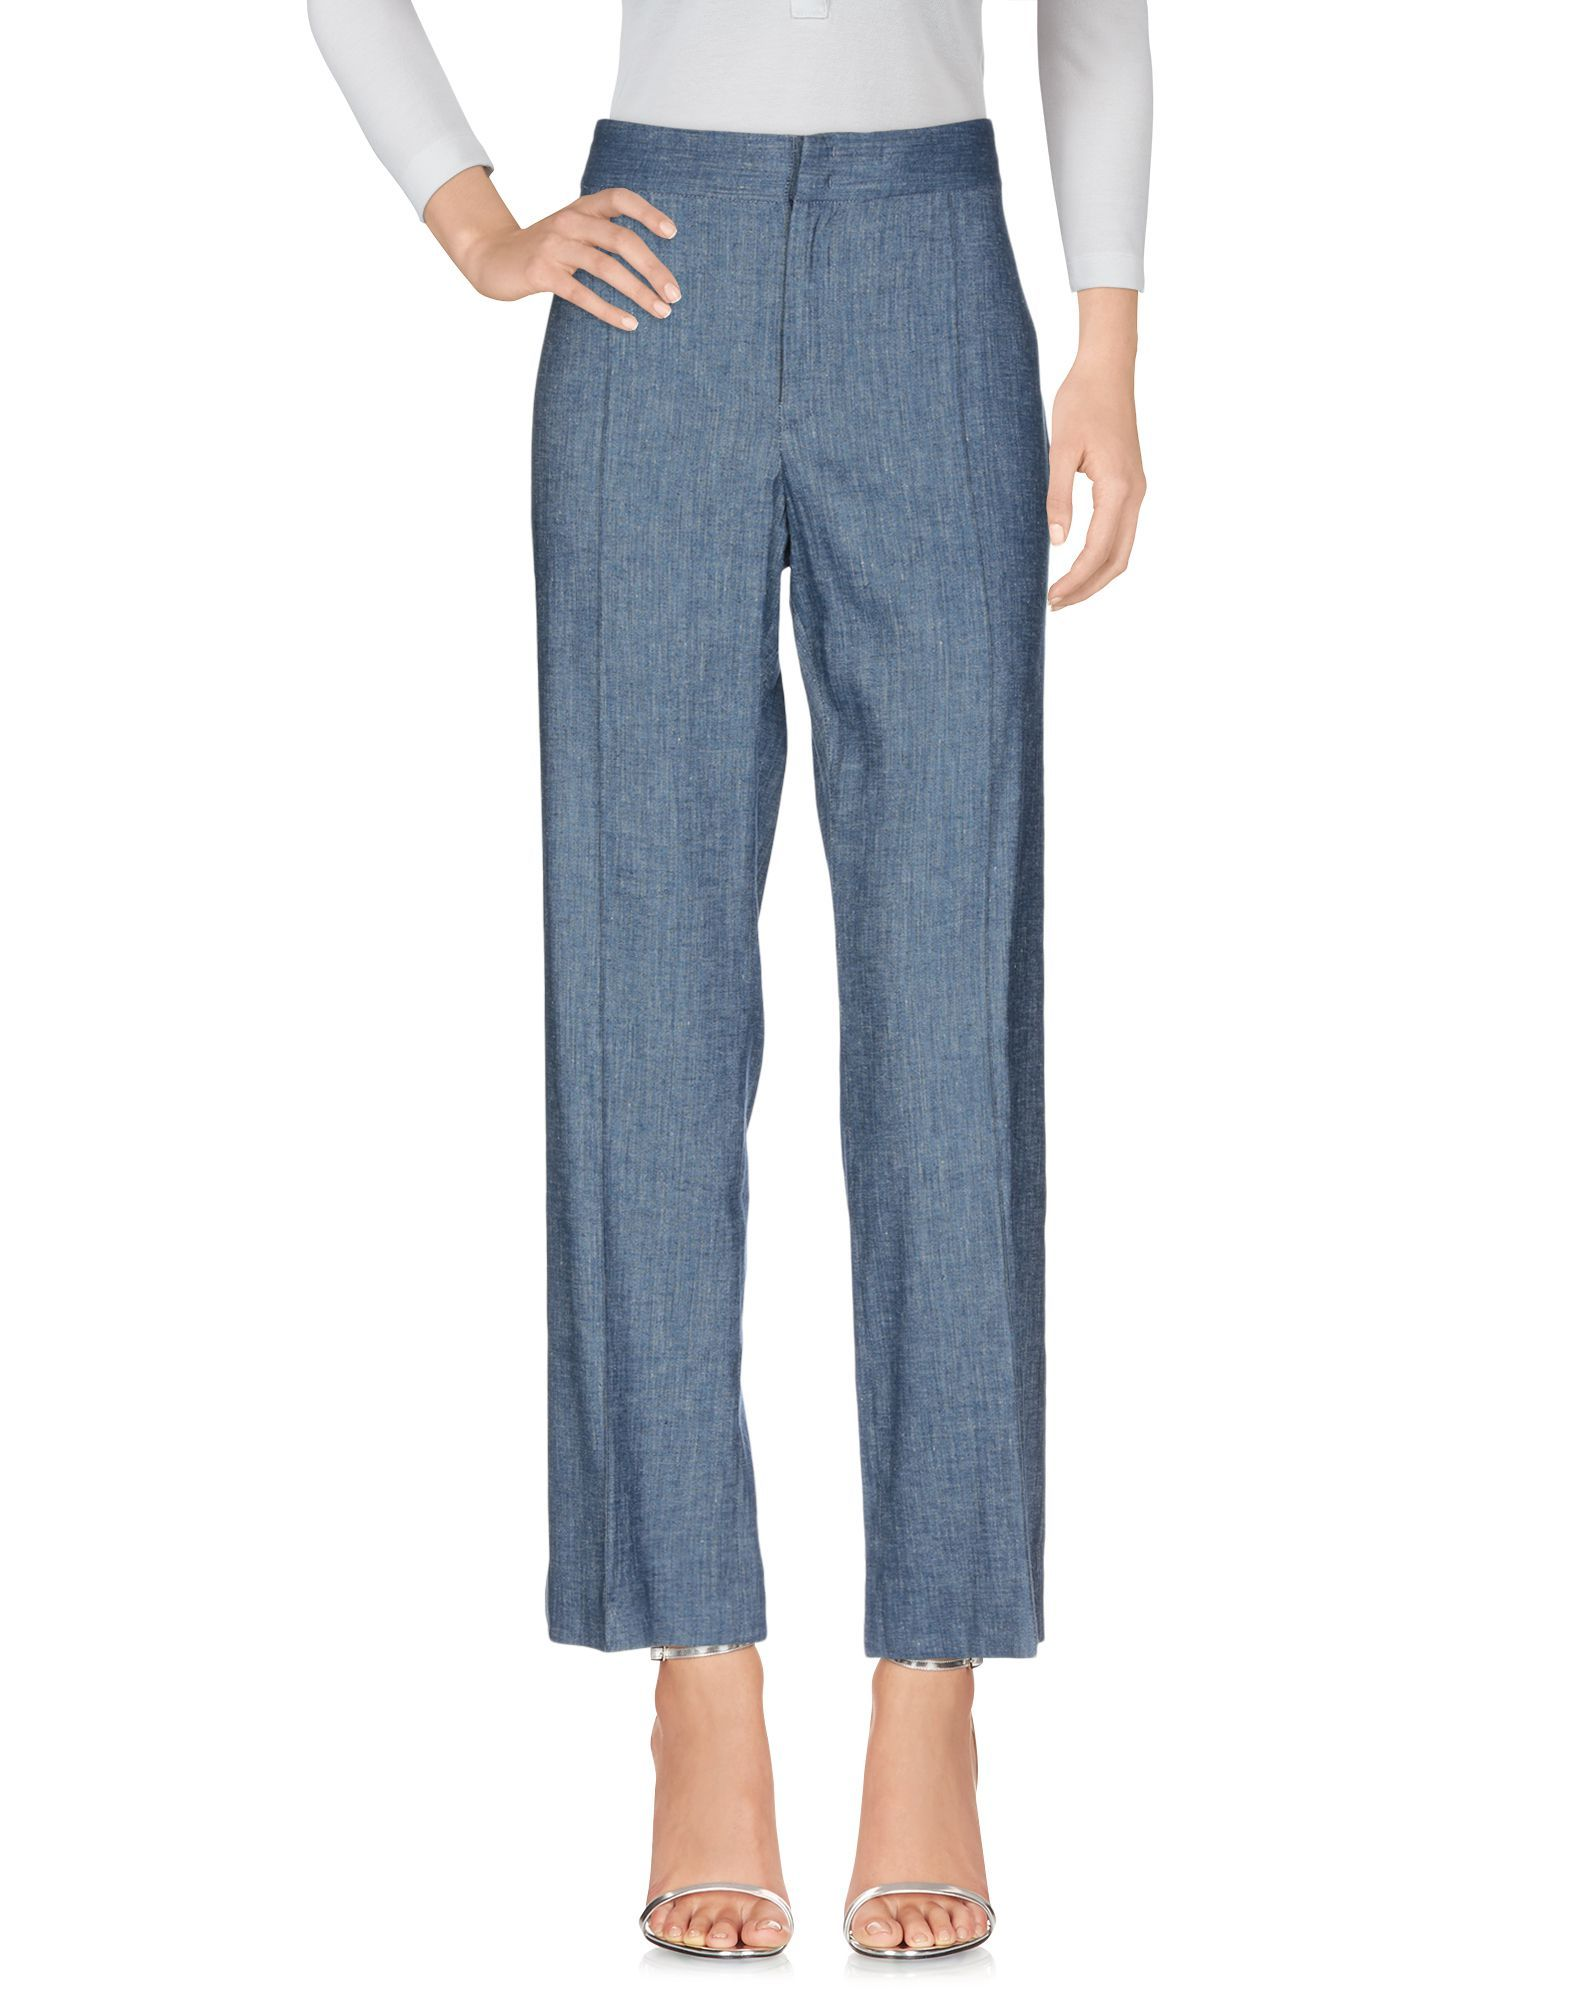 Isabel Marant Etoile Blue Linen Trousers